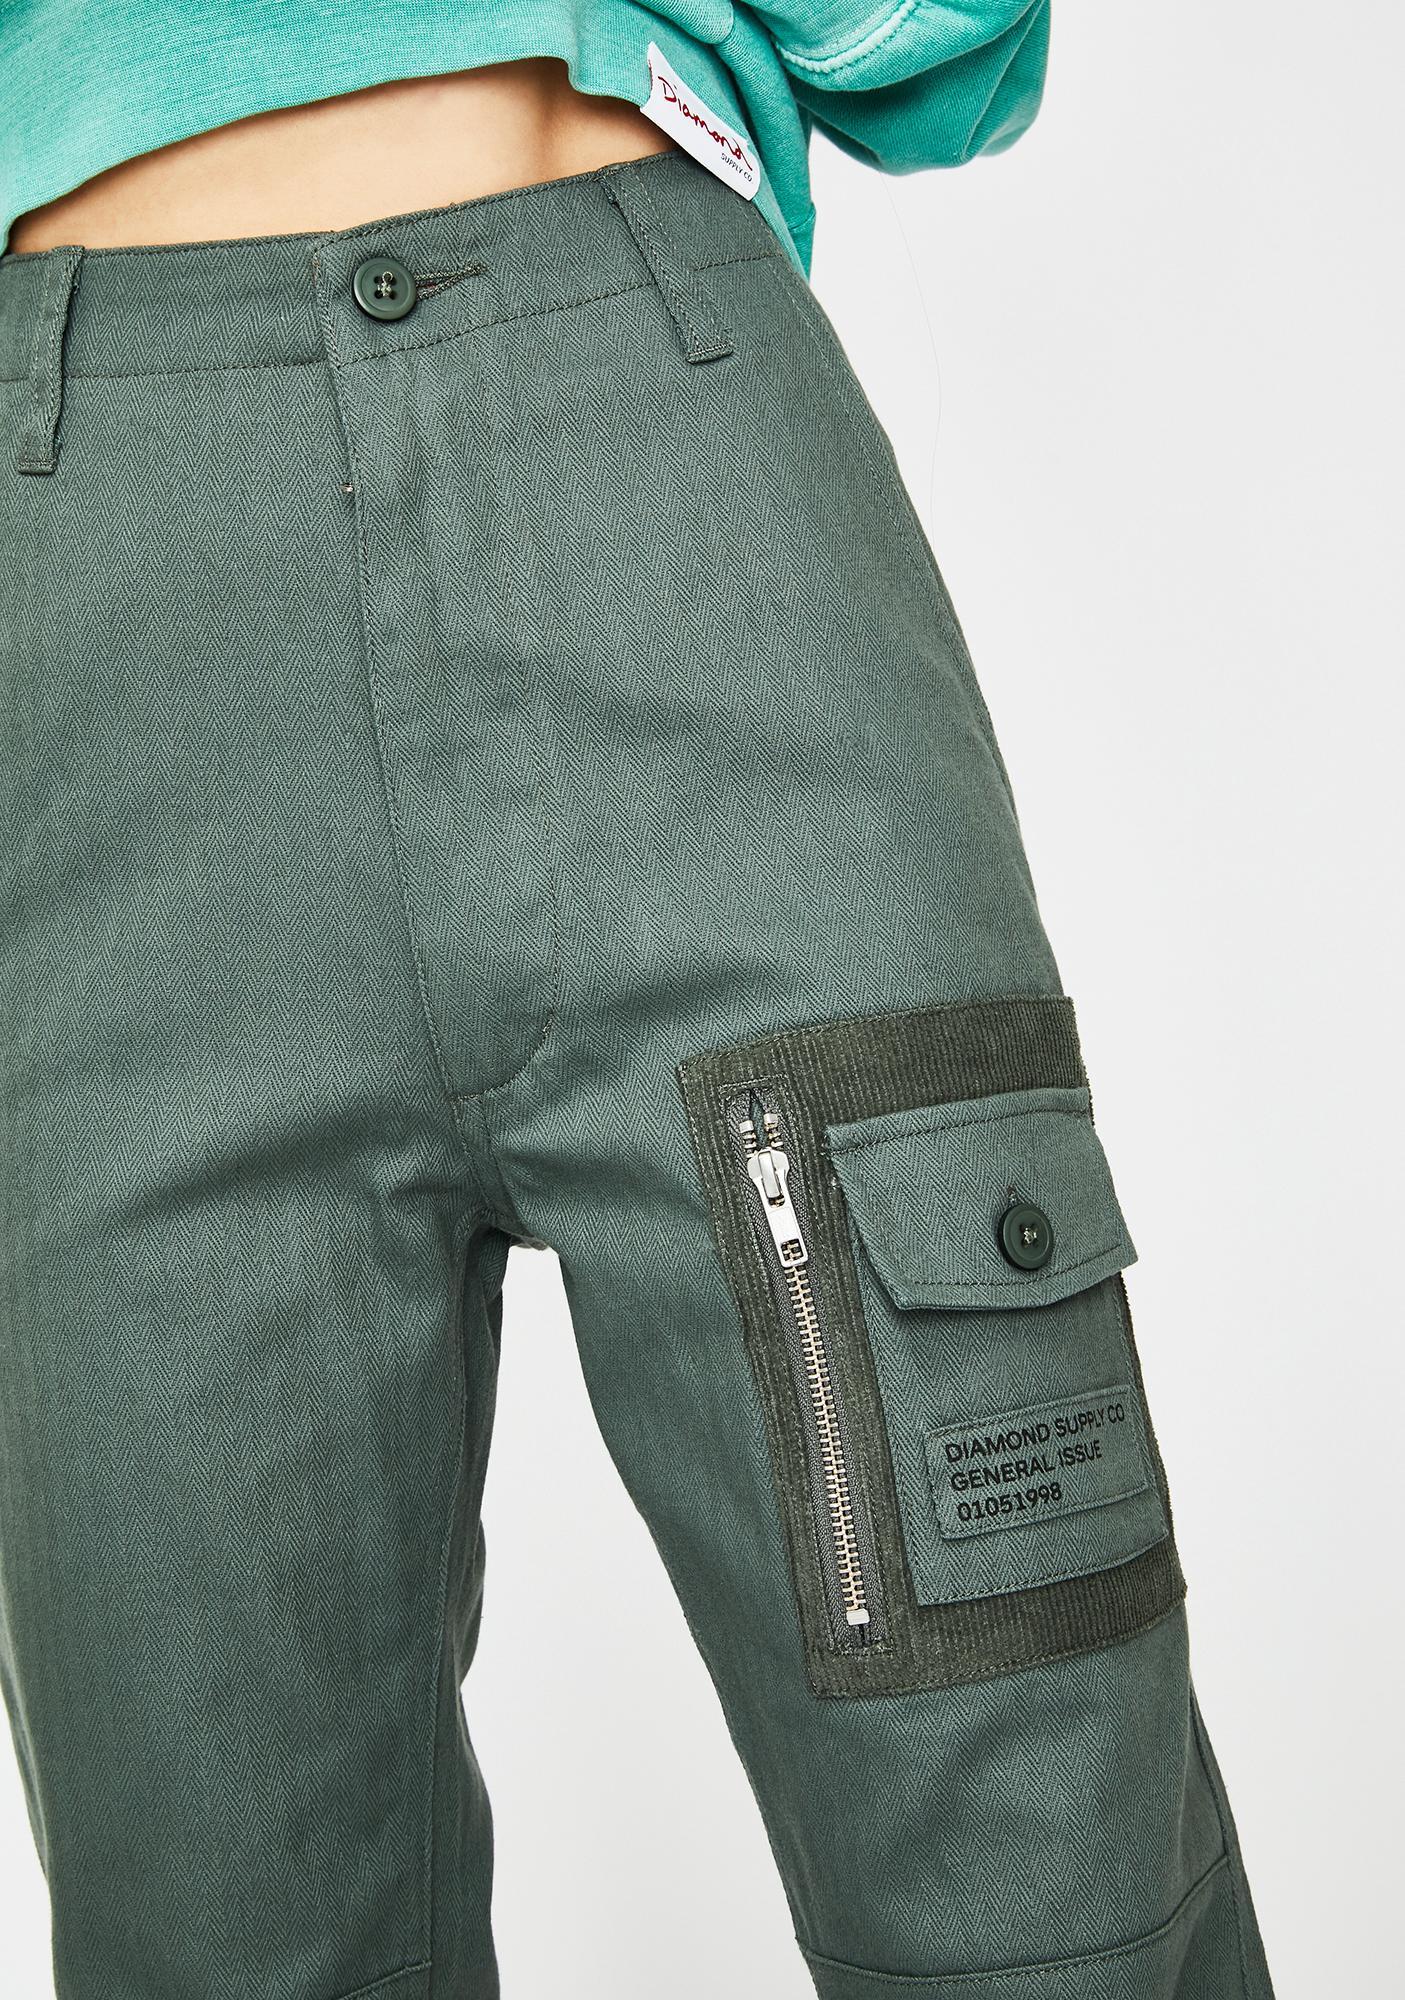 Diamond Supply Co Bunker Herringbone Cargo Pants